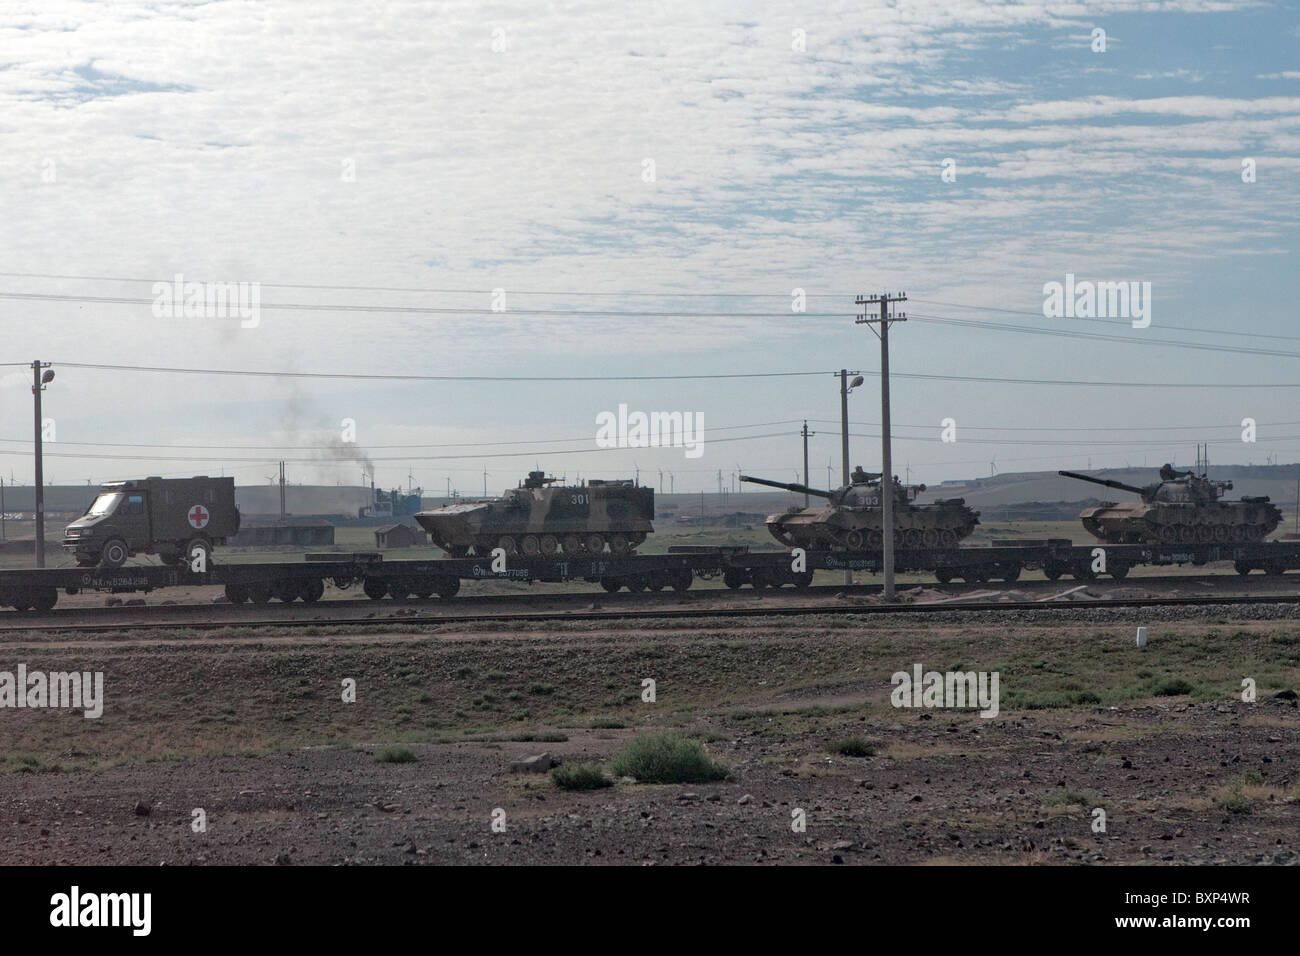 Trans-Mongolian Express China Vistas - army vehicles - Stock Image